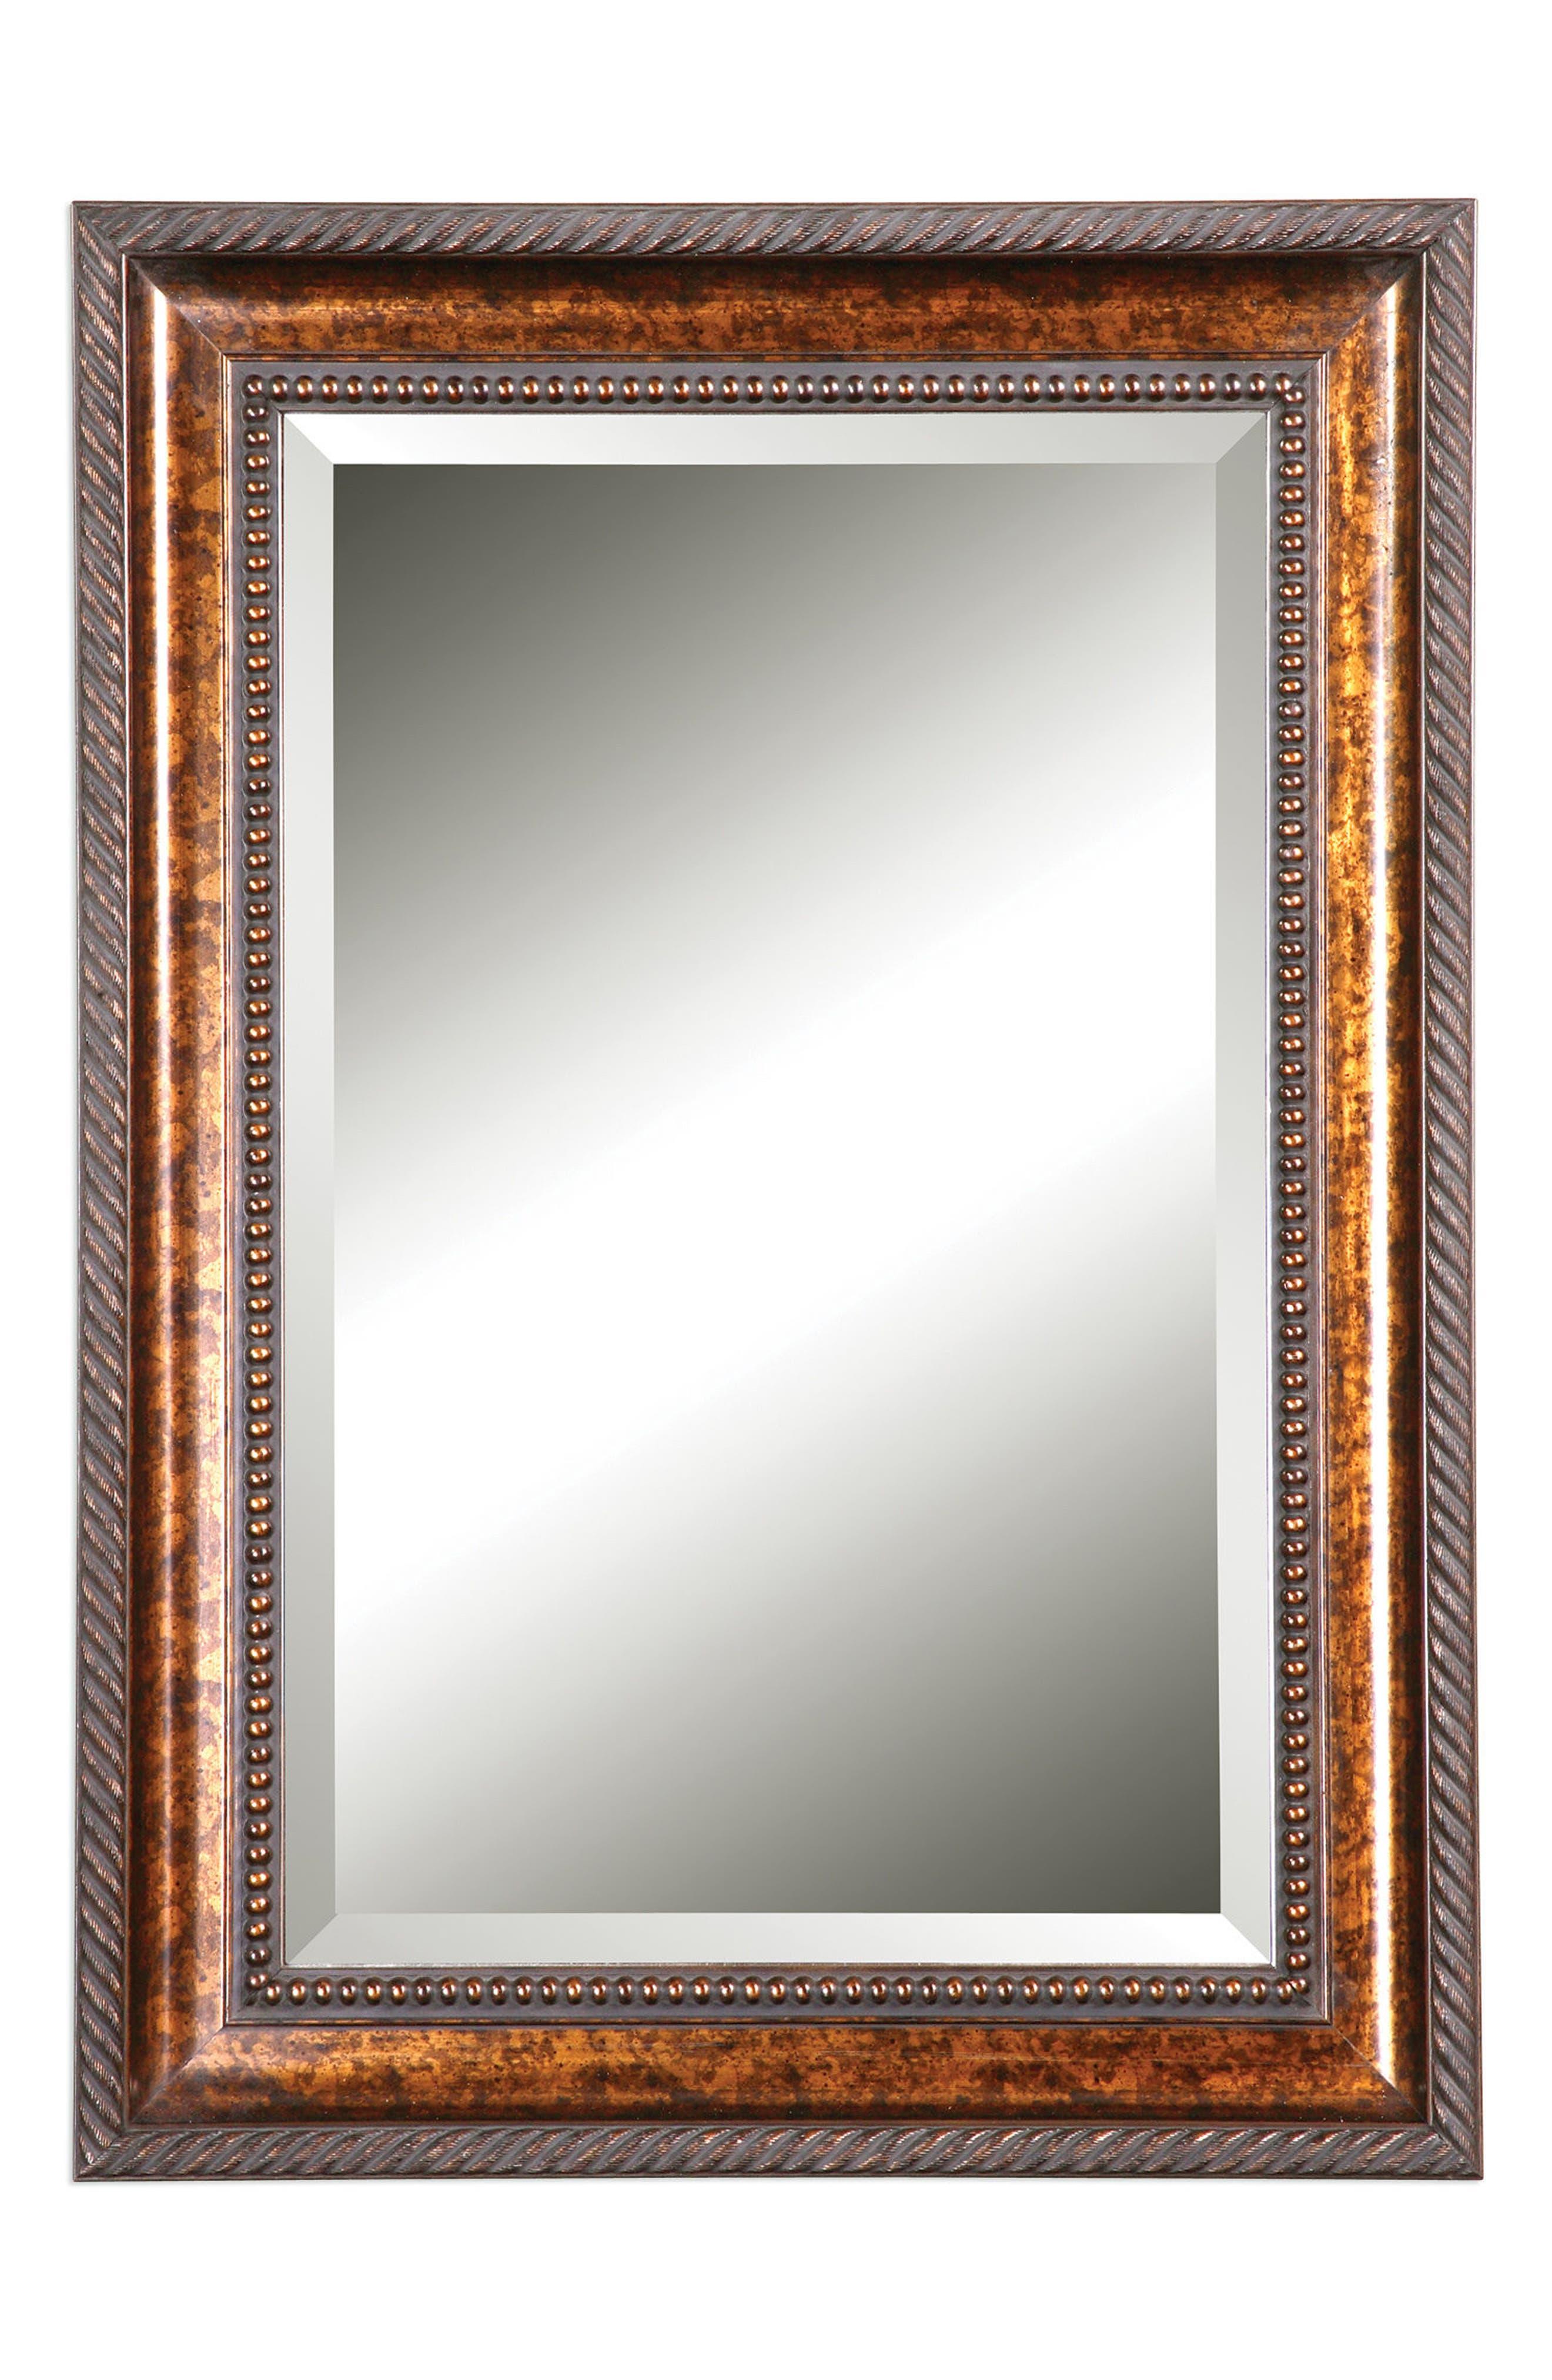 Alternate Image 1 Selected - Uttermost Sinatra Vanity Mirror